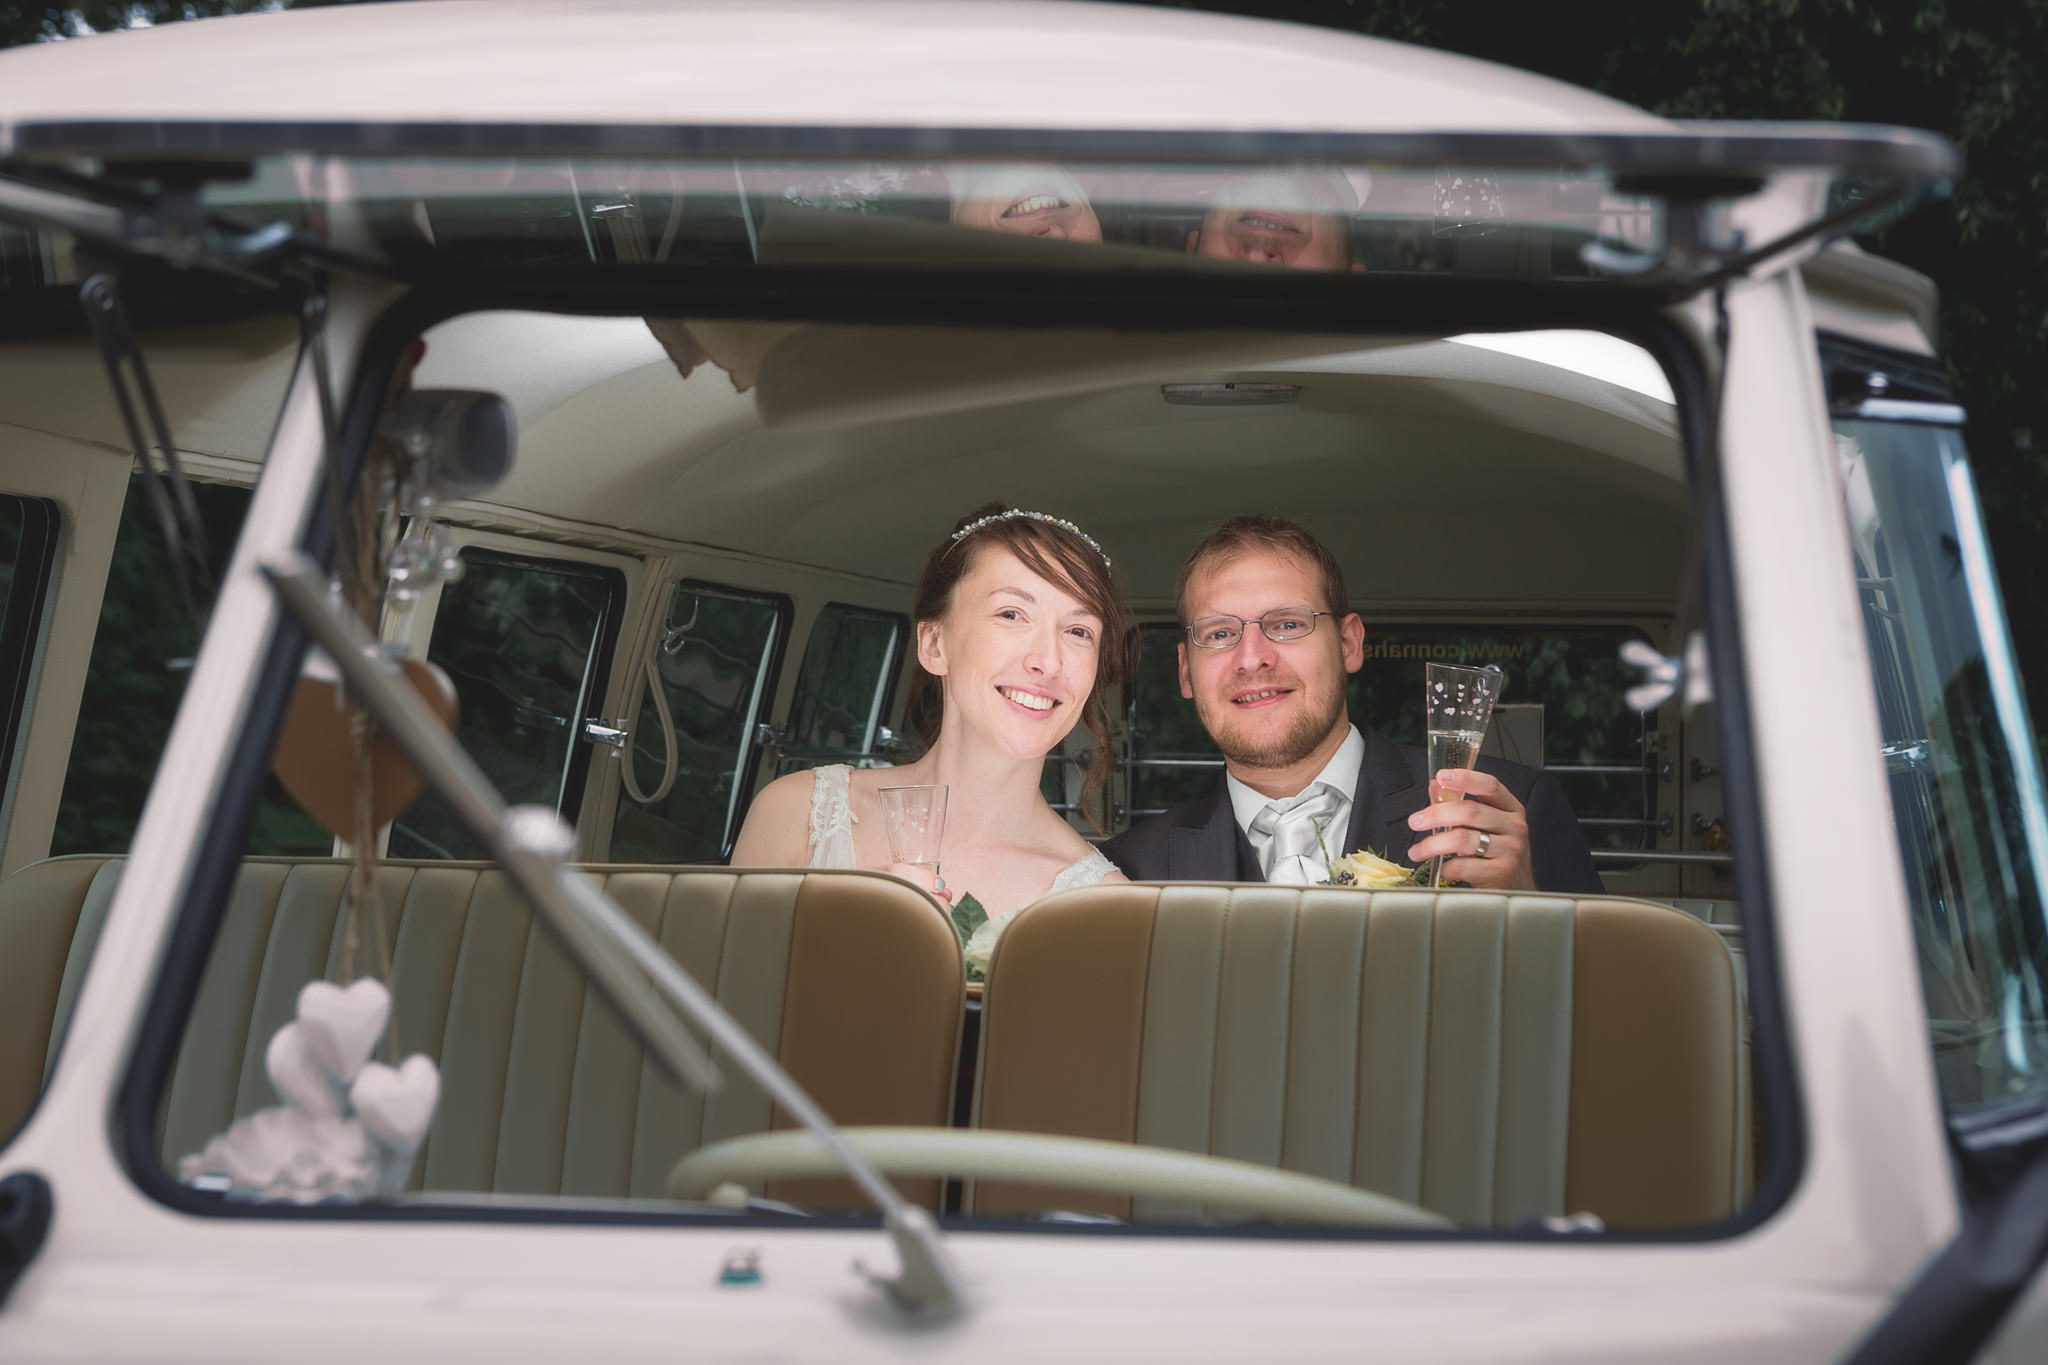 Derbyshire Wedding Photographer - Helen and Rik